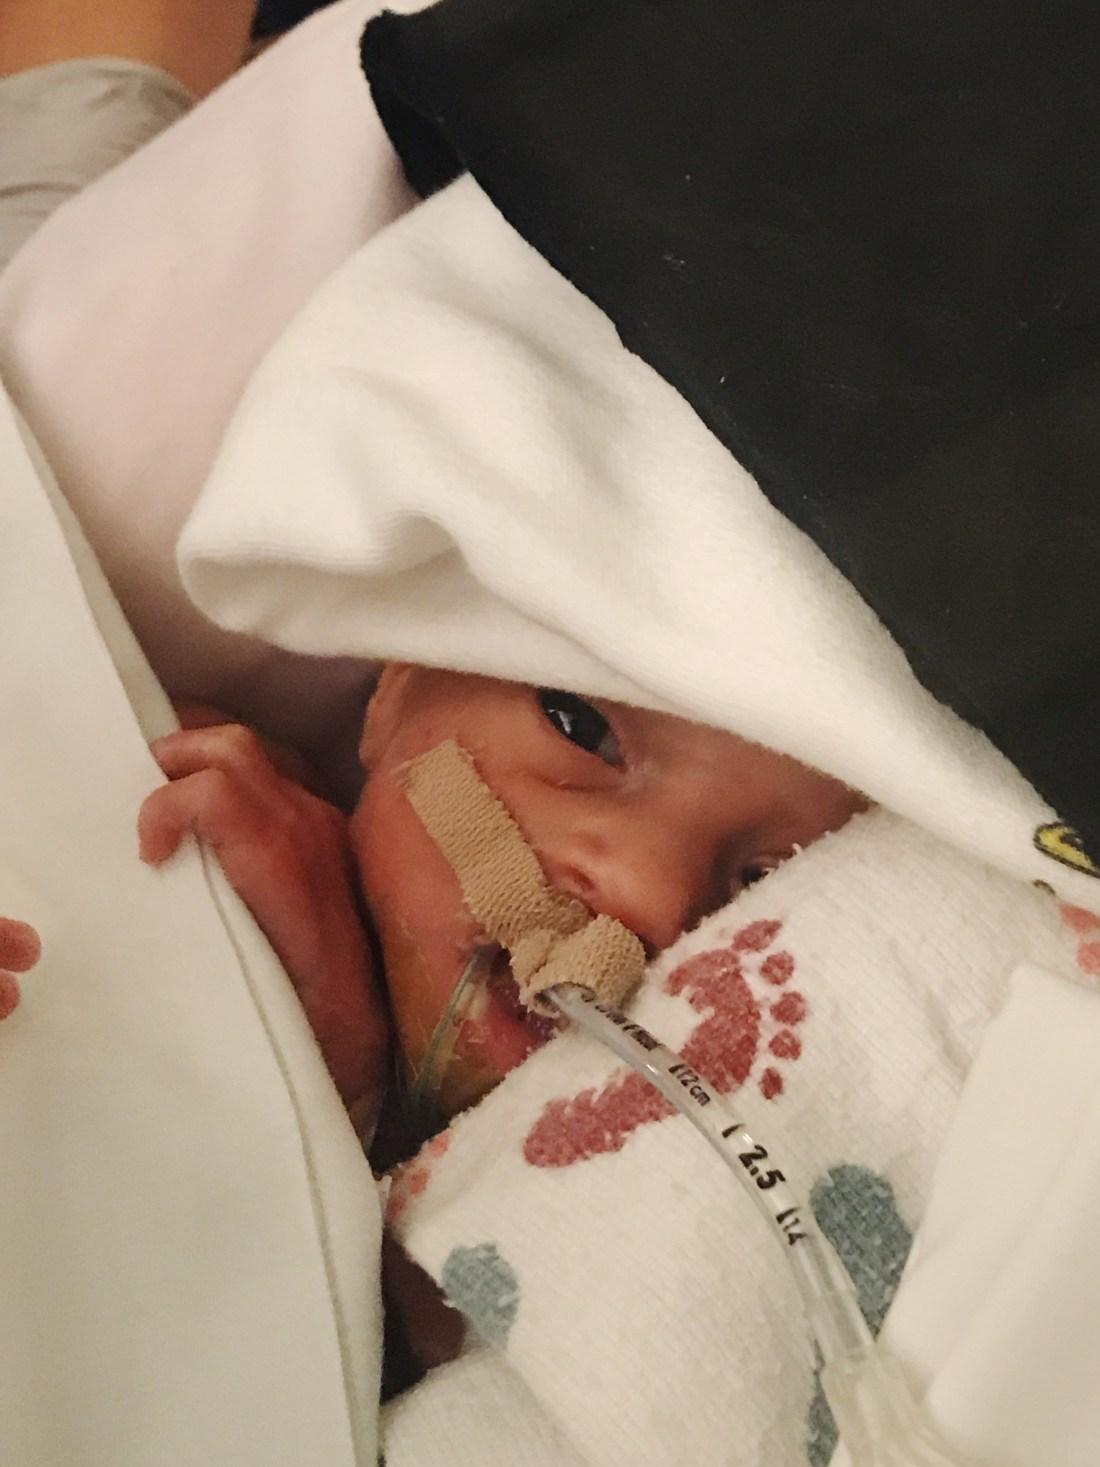 Birth story | Preemie Twins born at 30 weeks | NICU